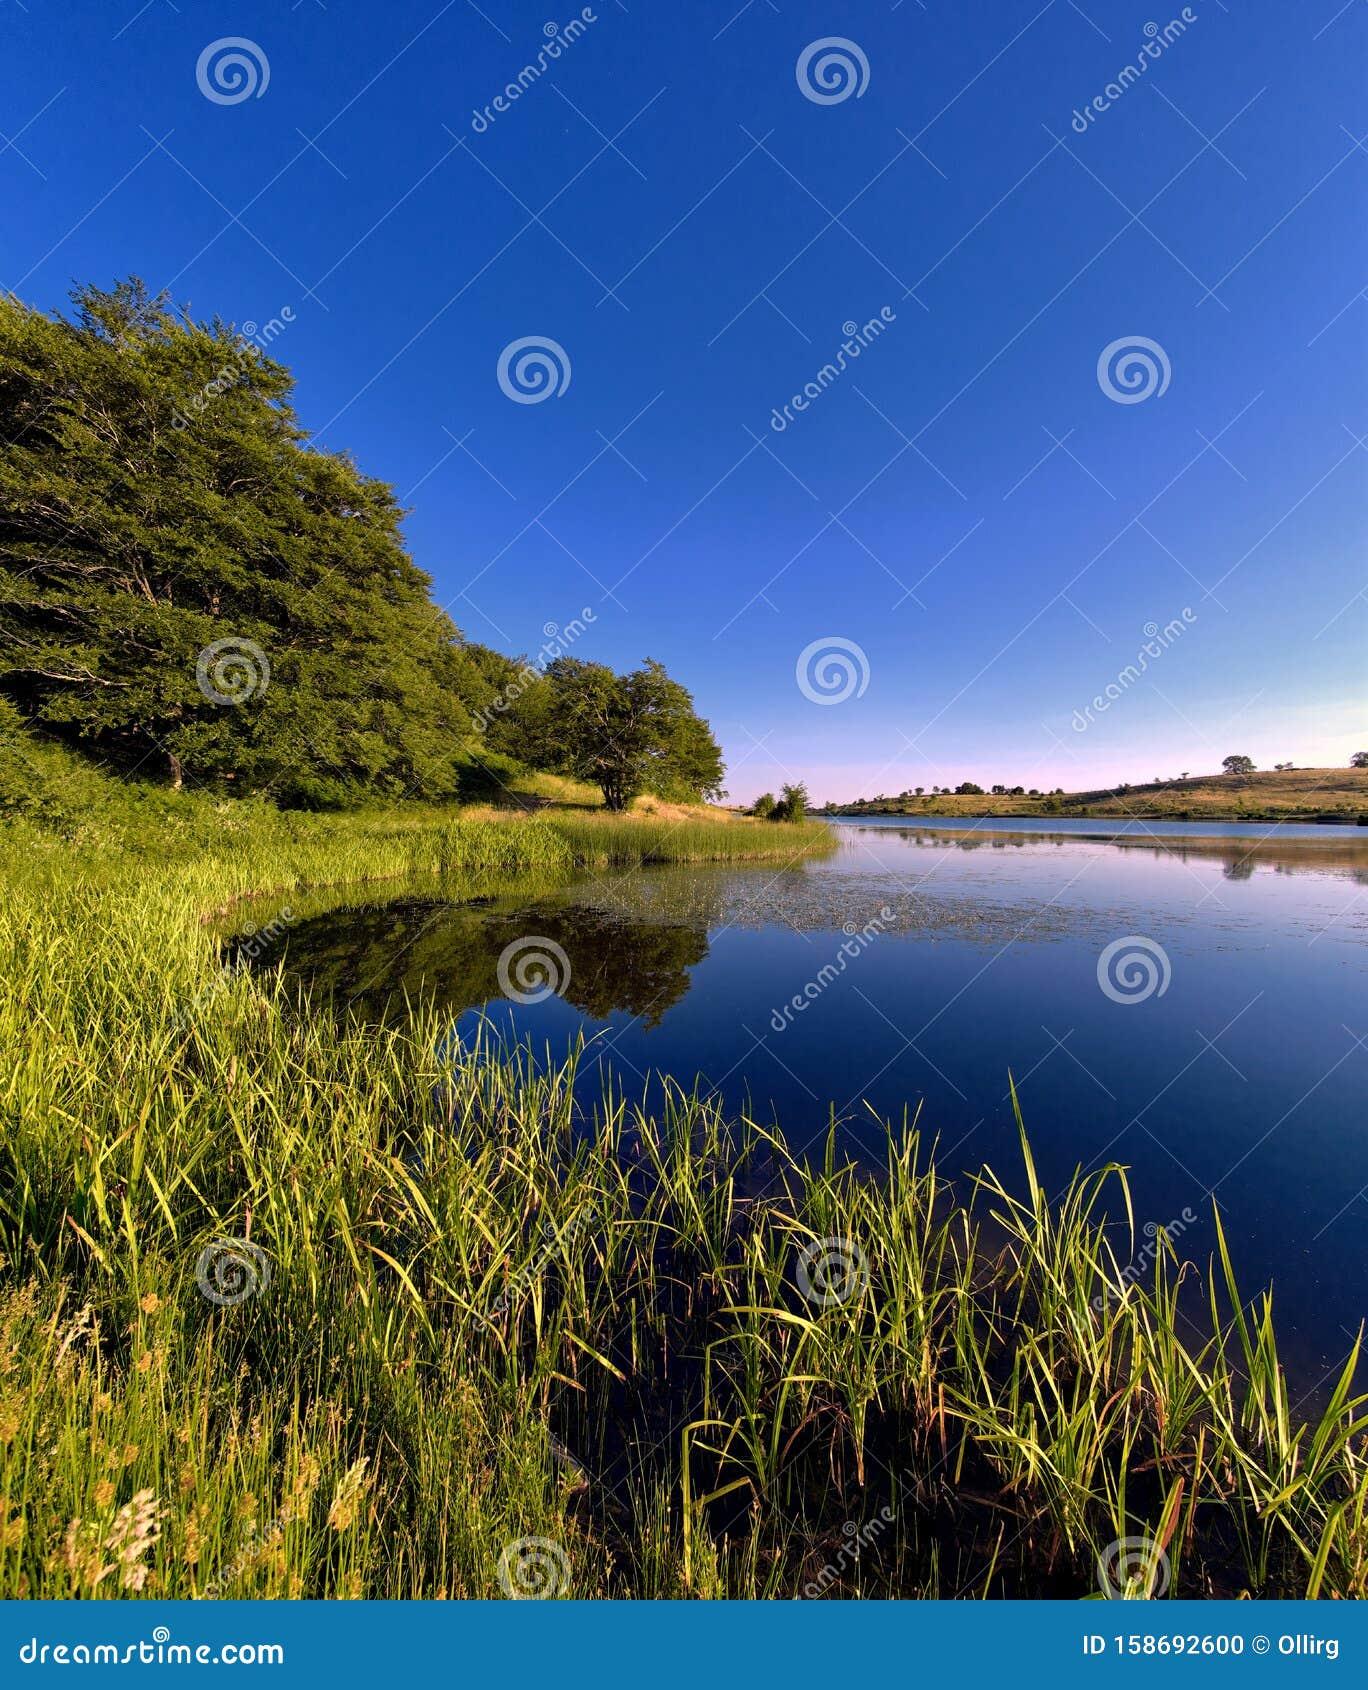 Biviere Lake Idyll Summer Scene In Nebrodi Park, Sicily